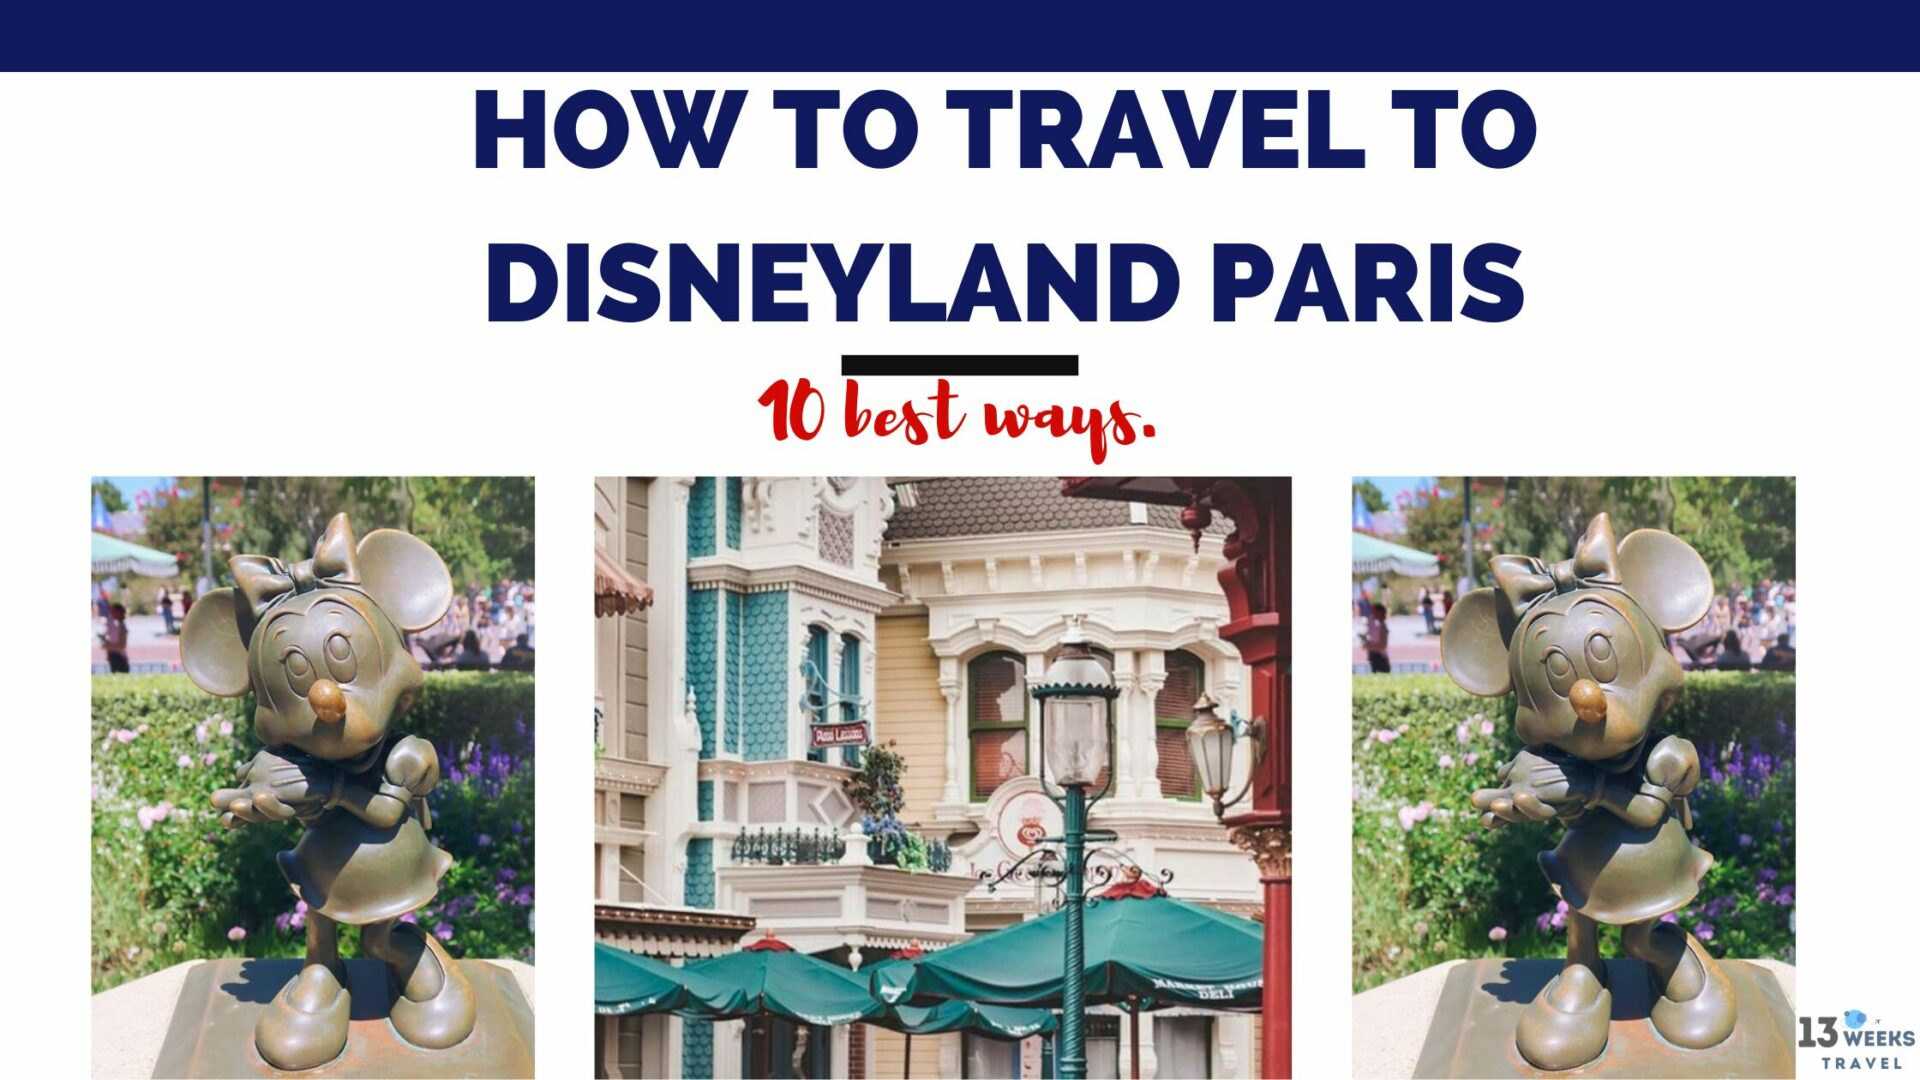 How to travel to Disneyland Paris FP